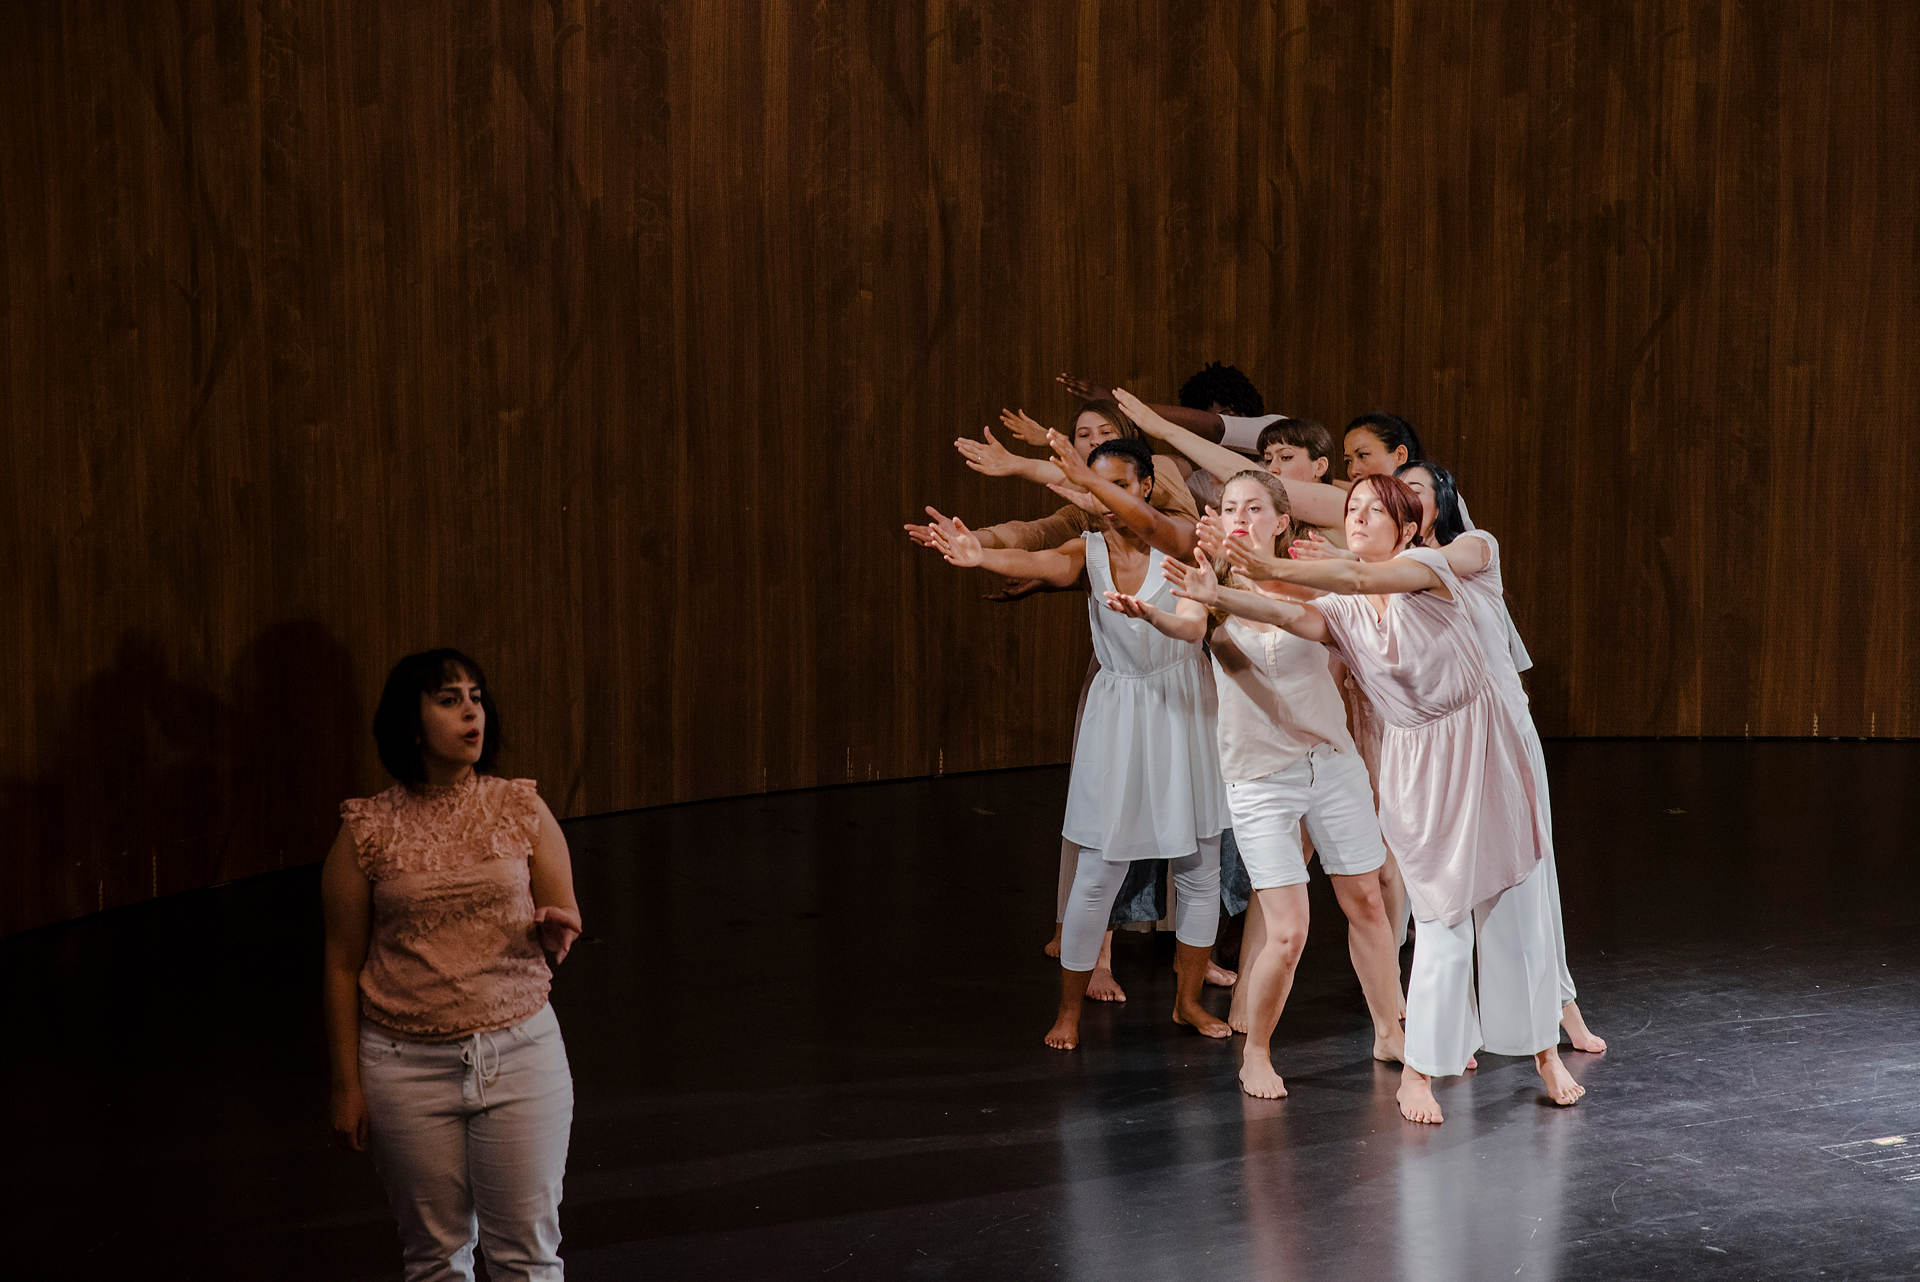 Image: Hawiyya Dance Co. perform at V&A for Refugee Week 2018